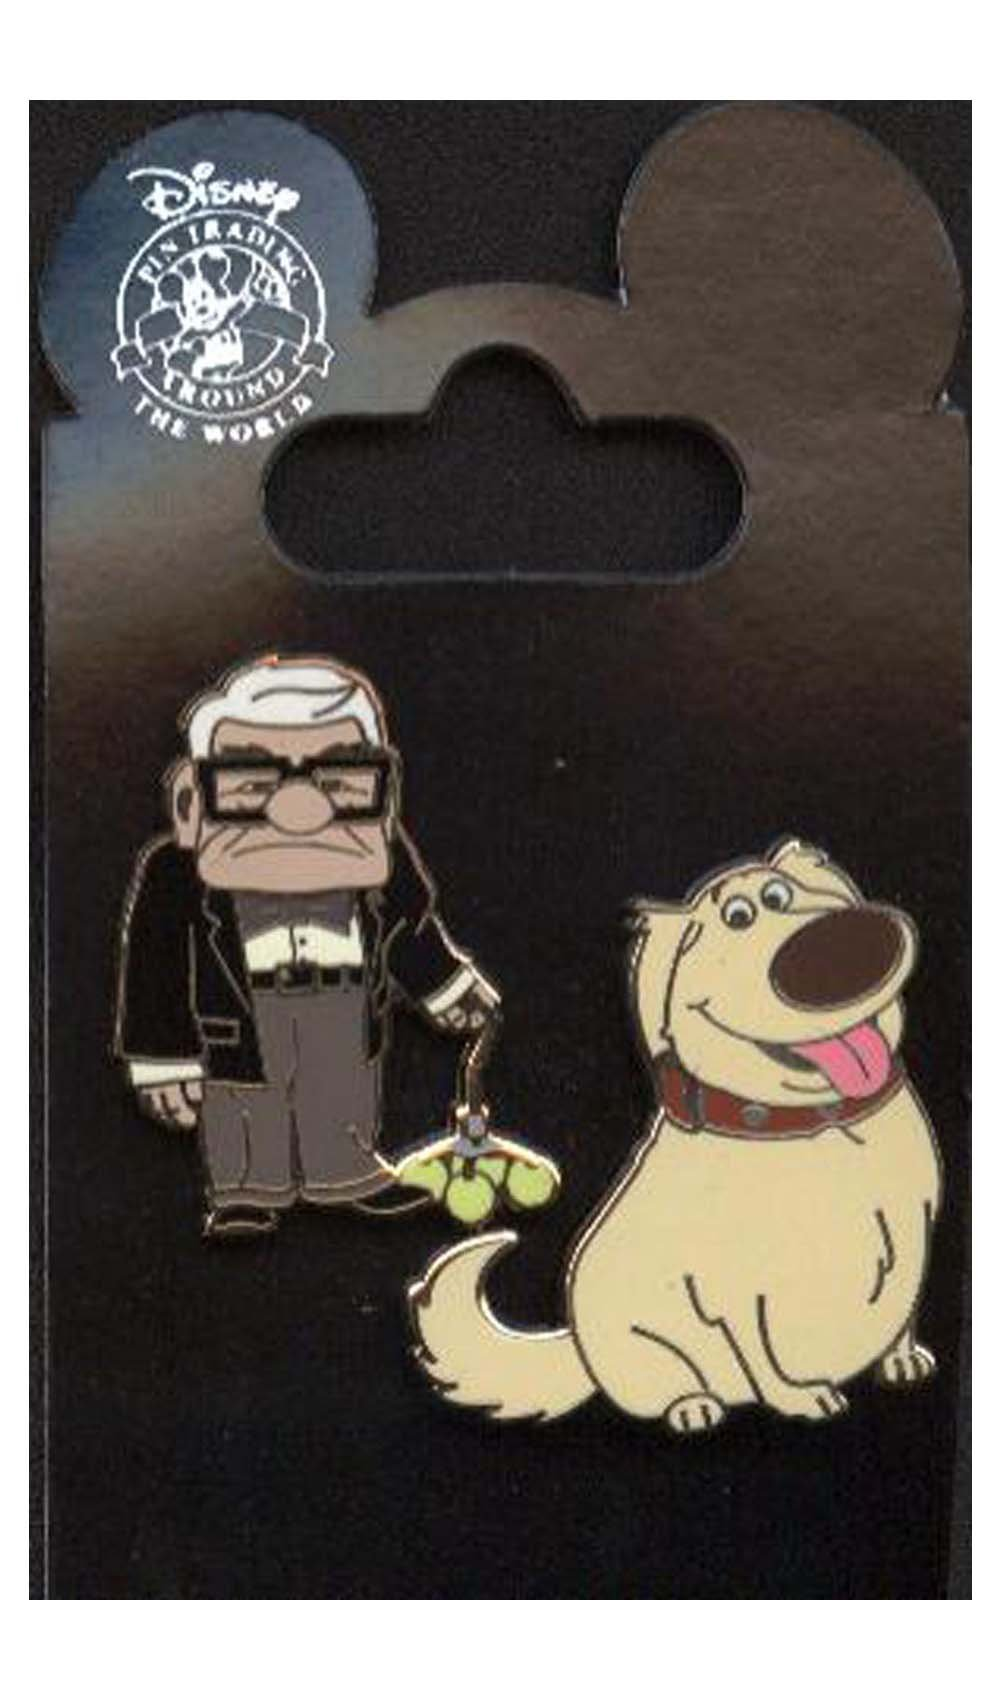 Disney Pin - Disney Pixar's Up - Dug and Carl Fredricksen - 2 Pin Set 79392